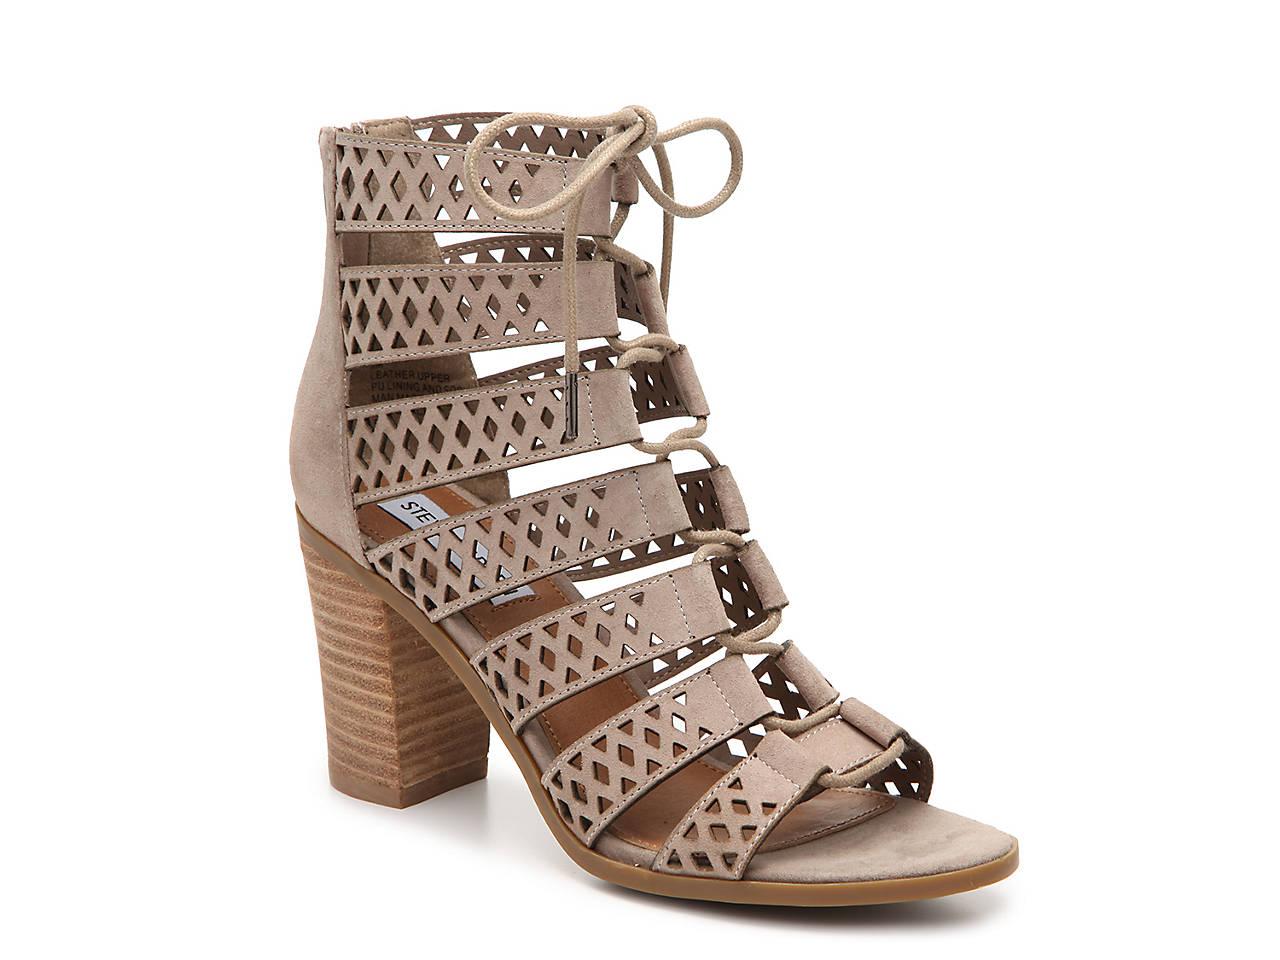 b00fce19596 Delphine Gladiator Sandal